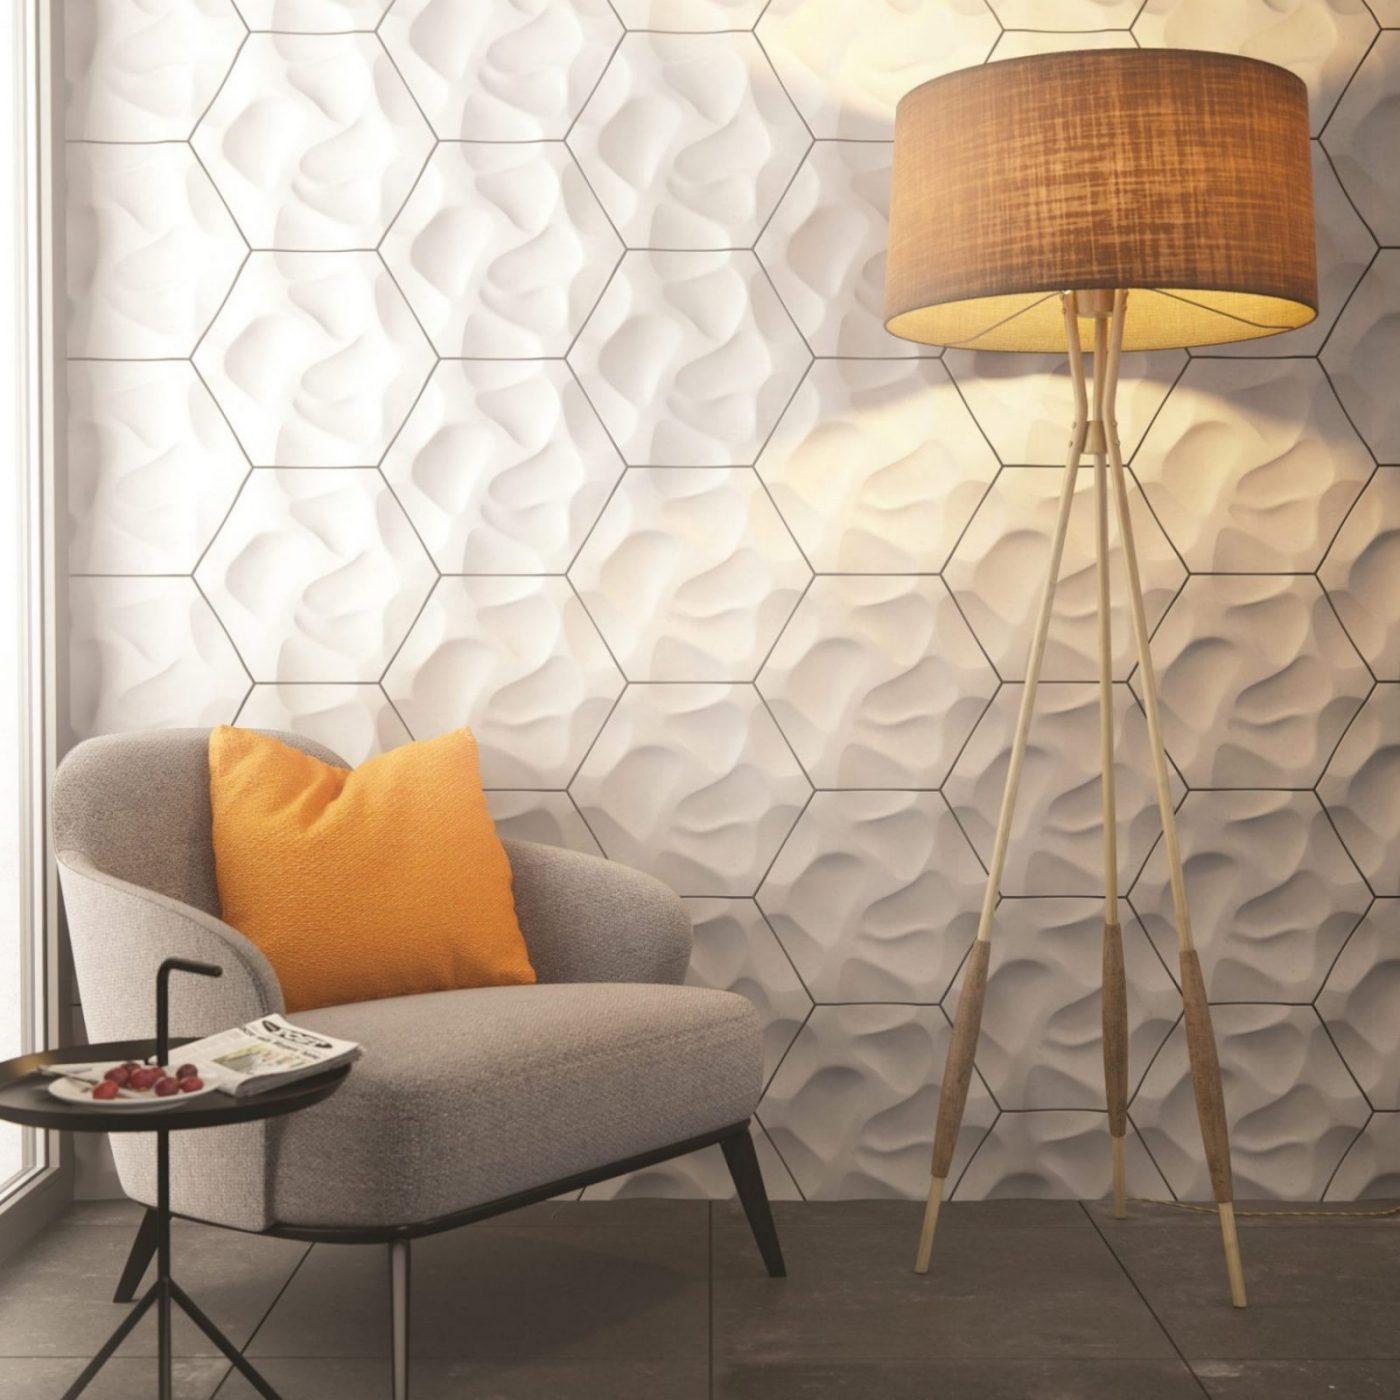 Wall Tiles By NMC Copley Decor